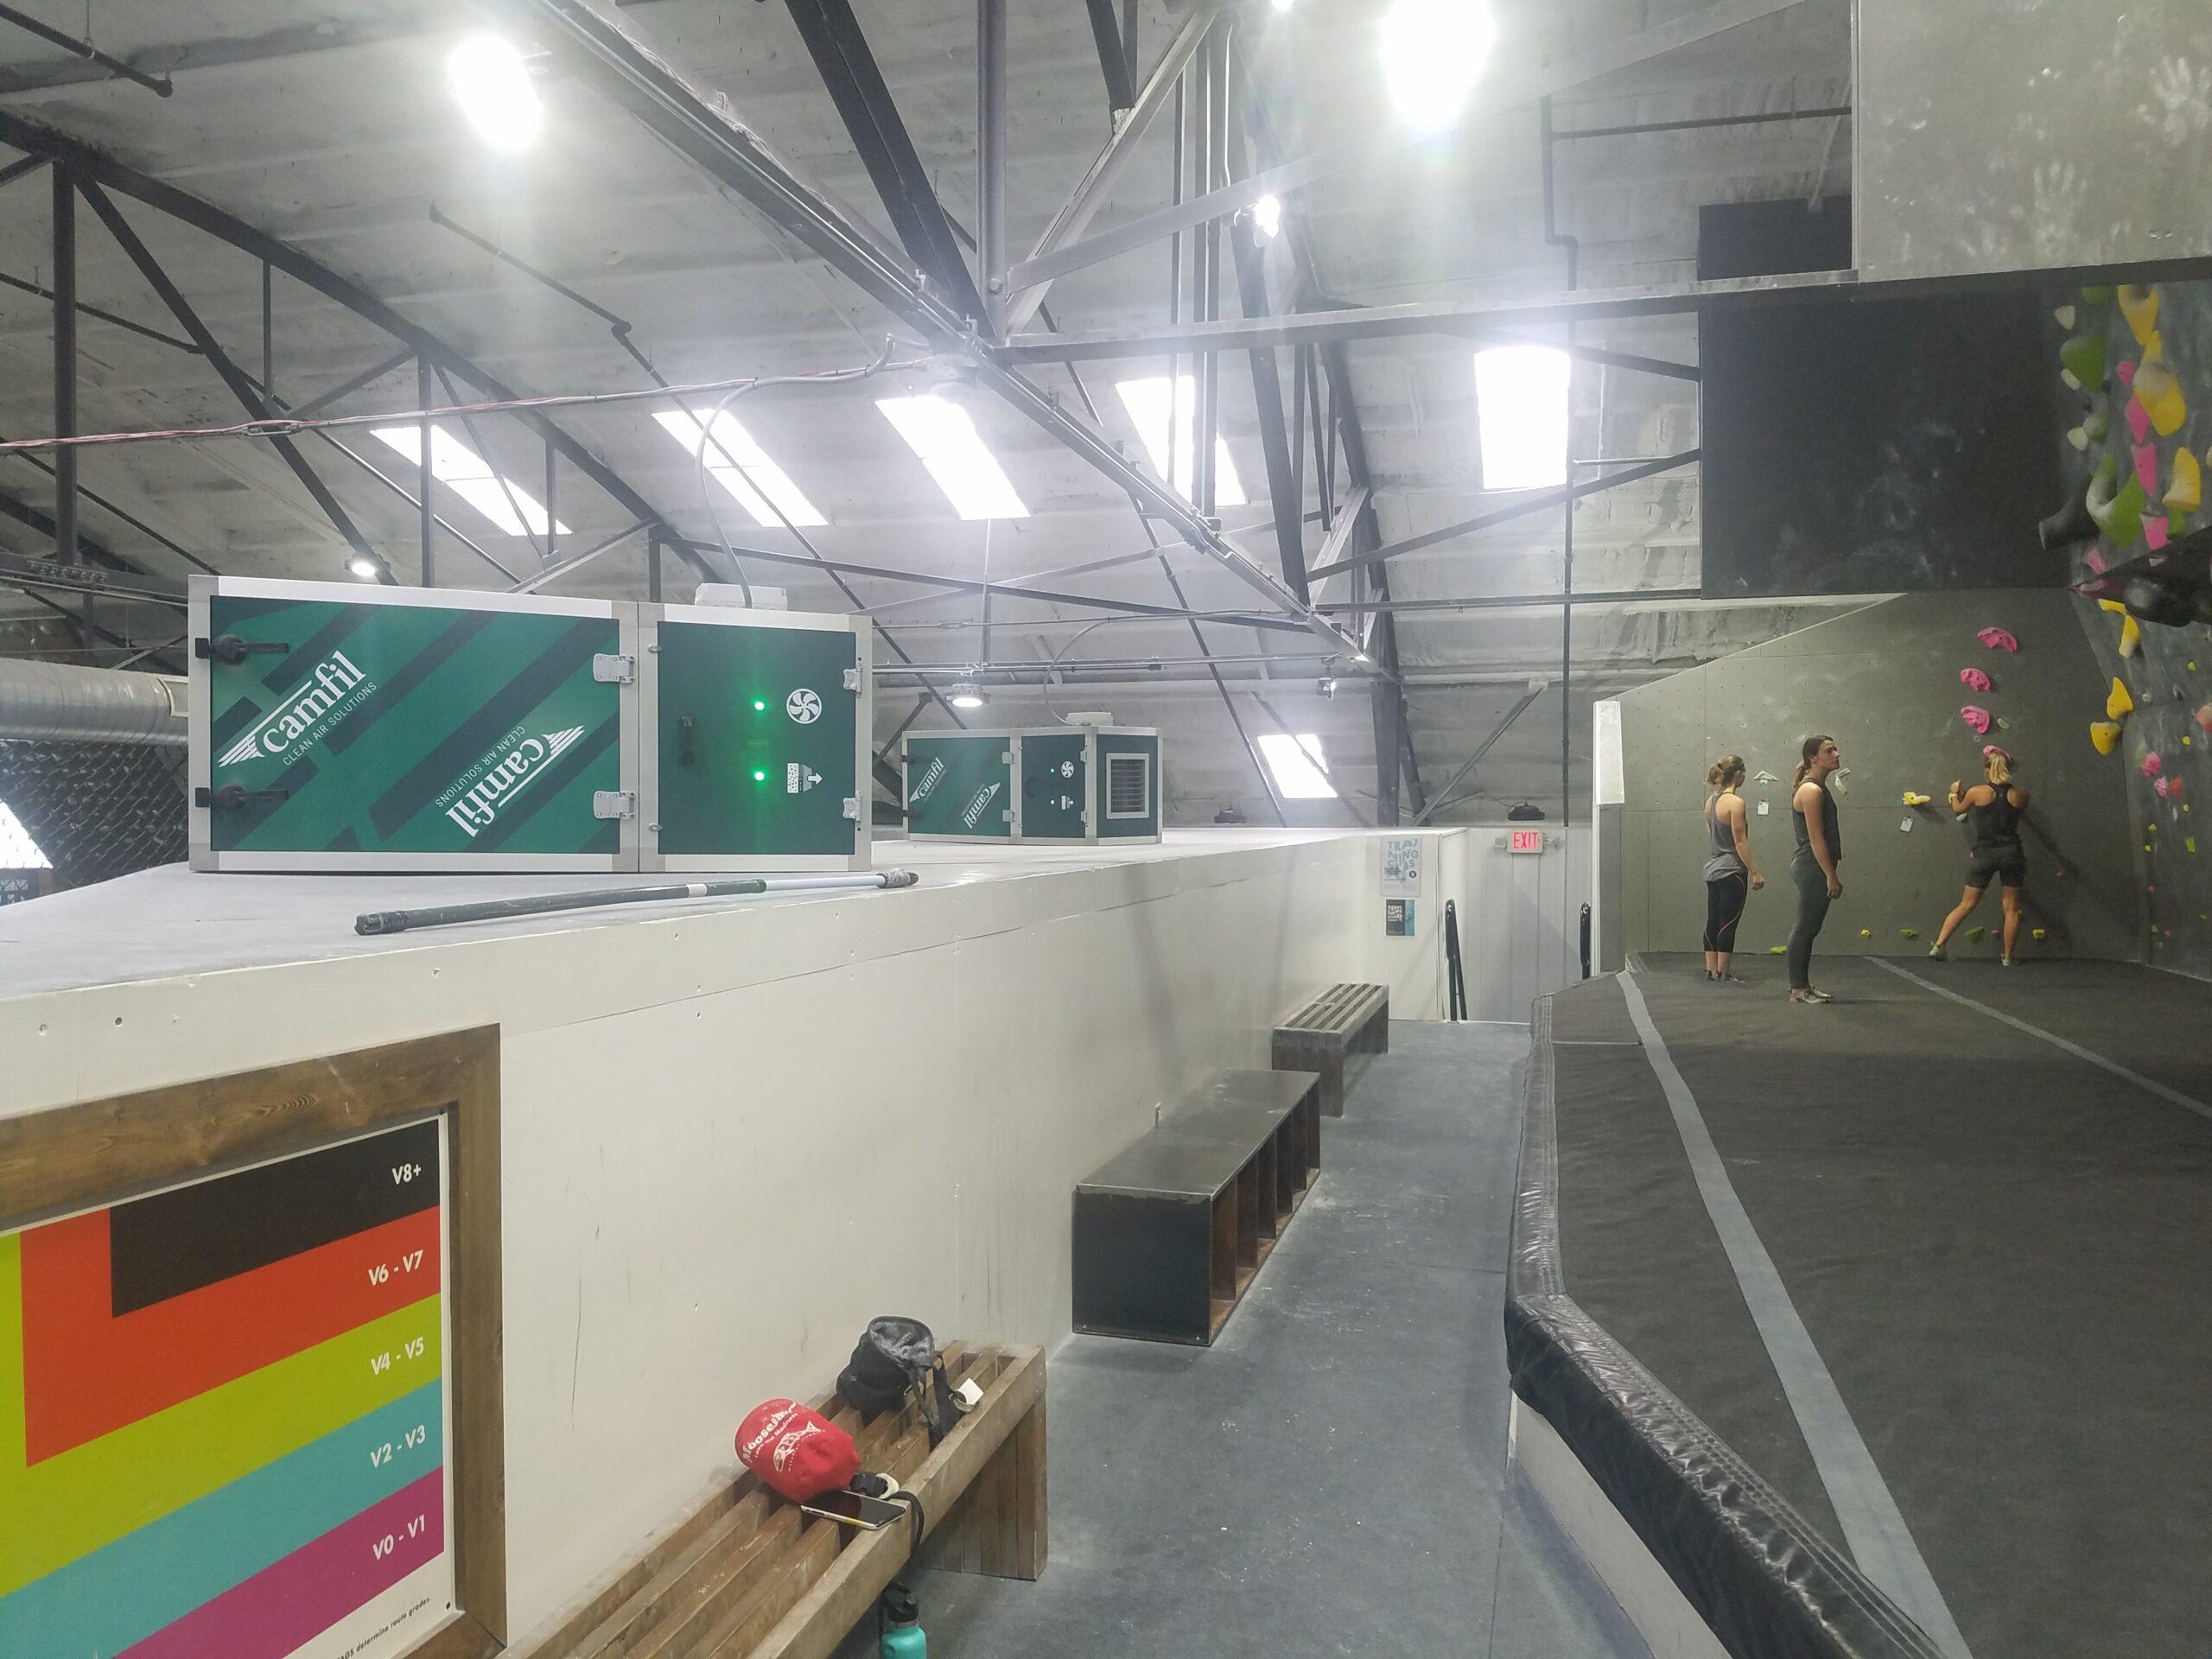 Purificadores de Aire en un gym